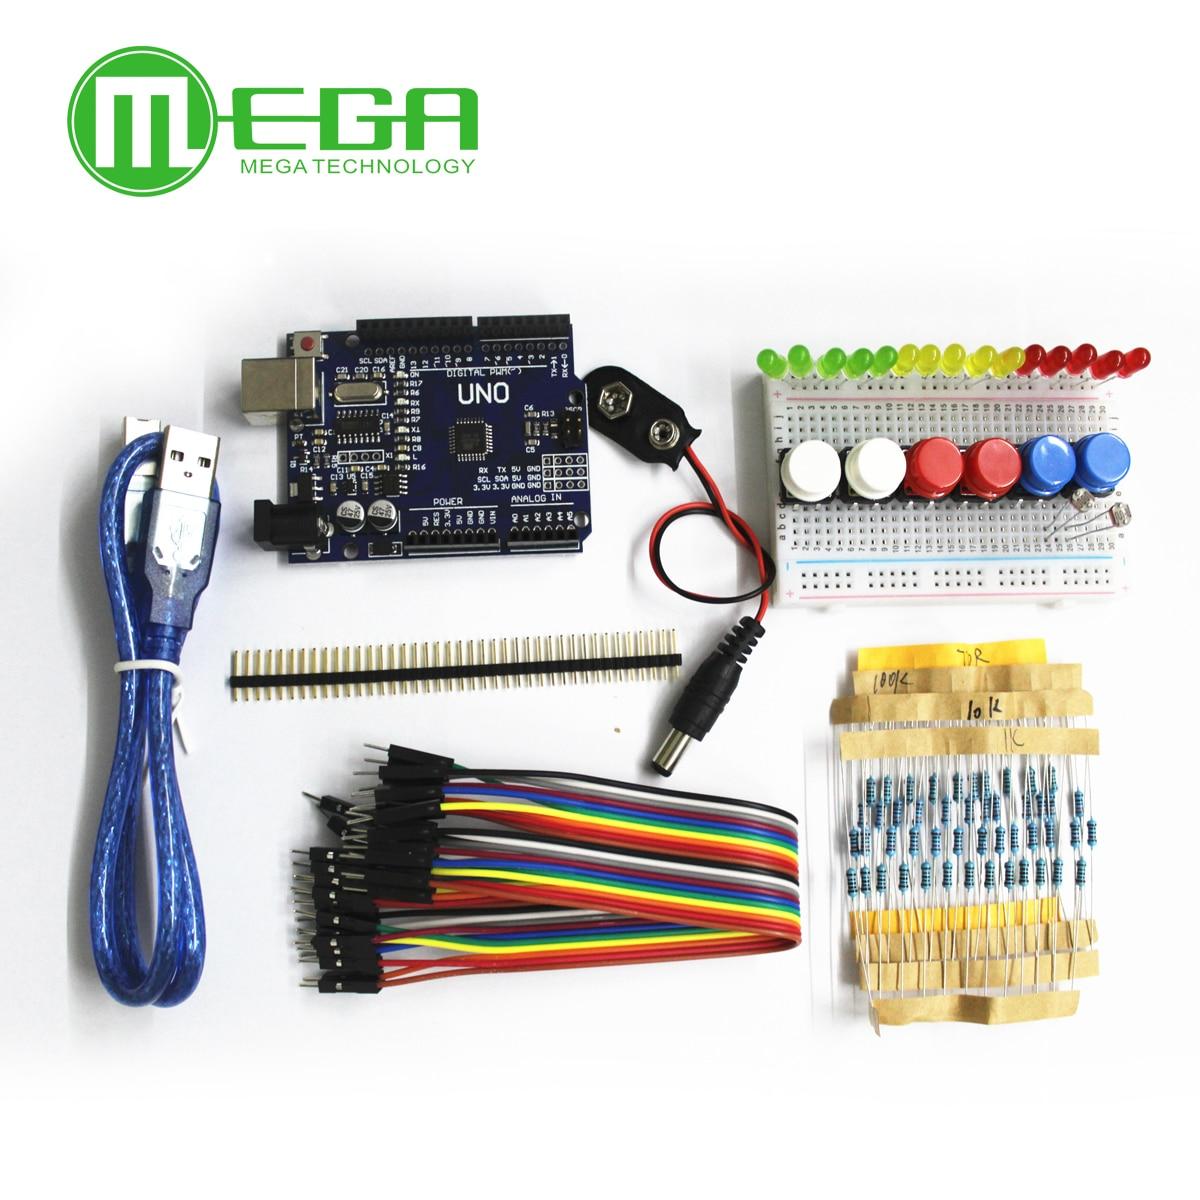 1 Unidades Starter Kit UNO R3 mini Breadboard puente botón LED para Arduino compatile